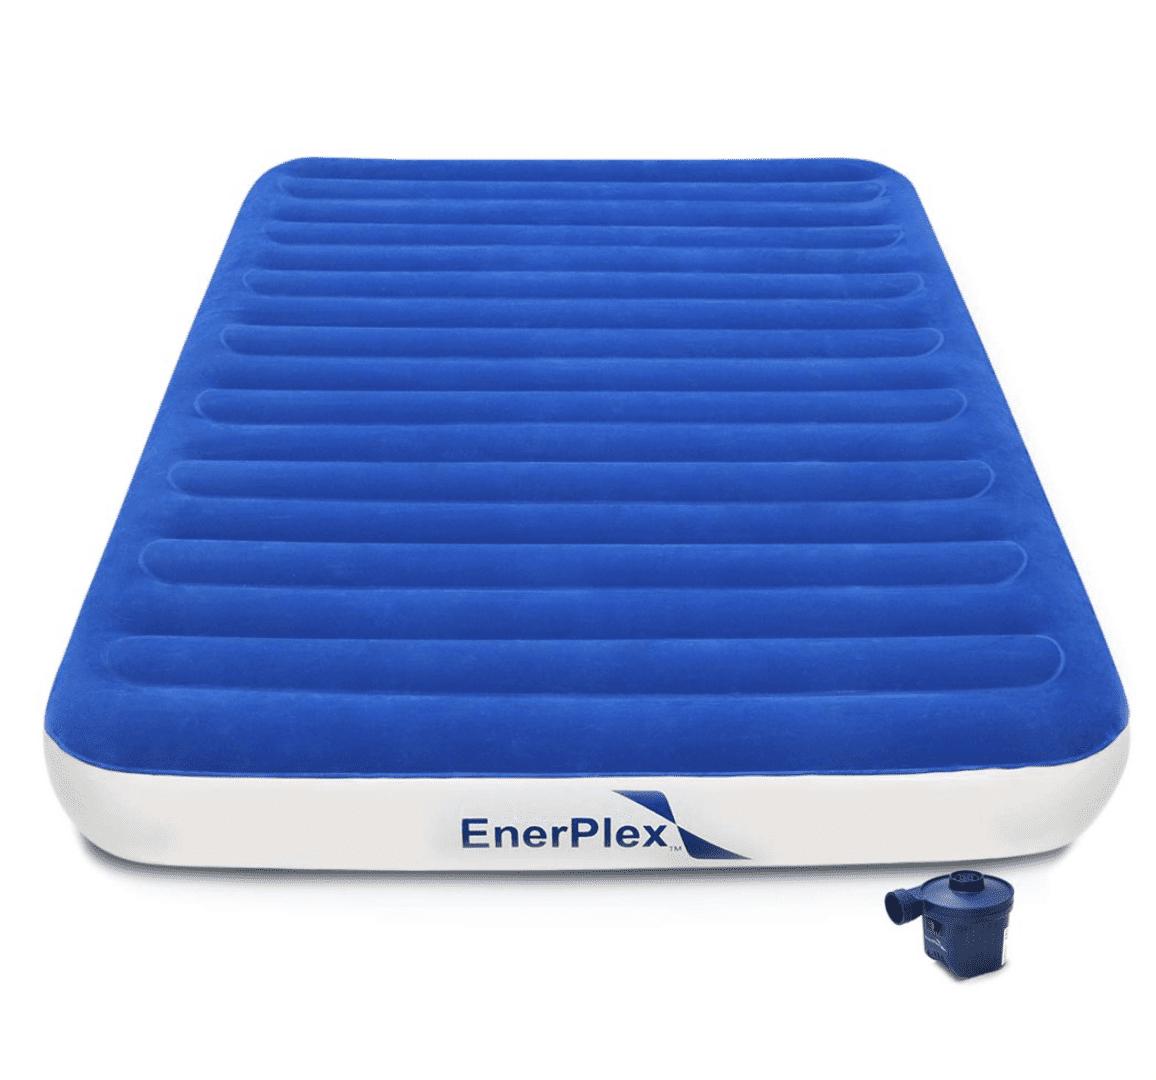 EnerPlex Luxury Camping Air Mattress